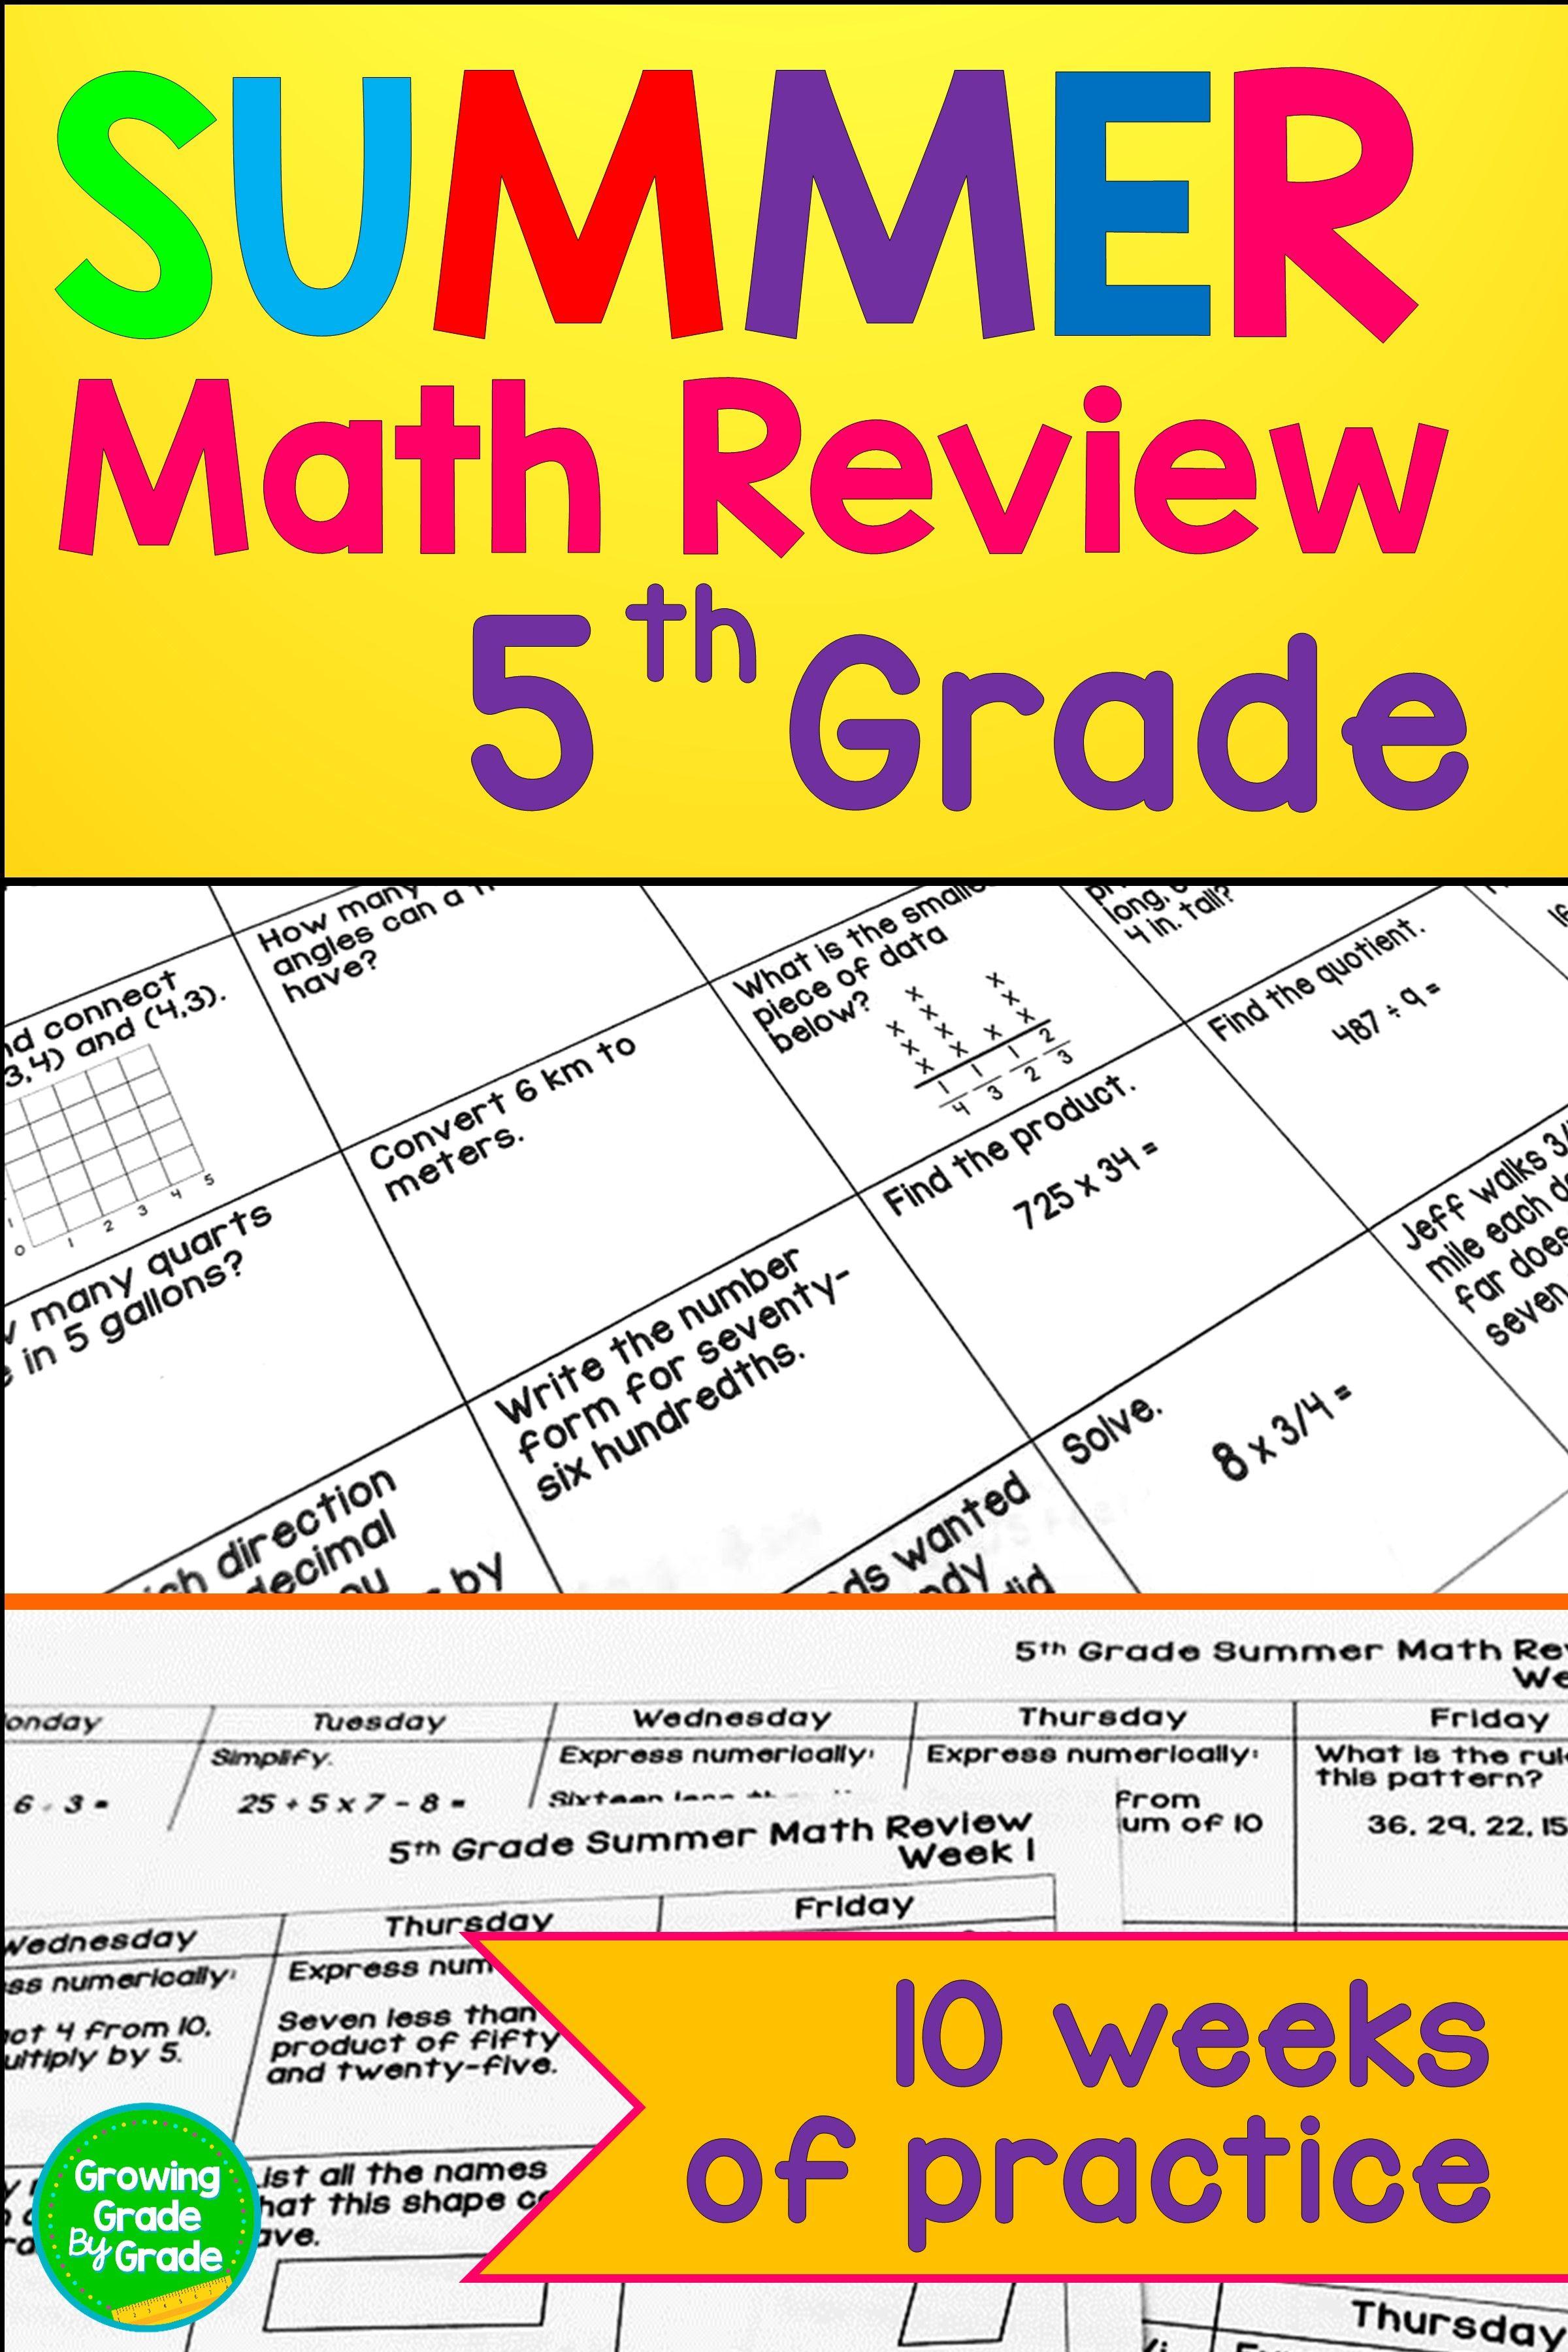 Summer Math Review 5th Grade 4th